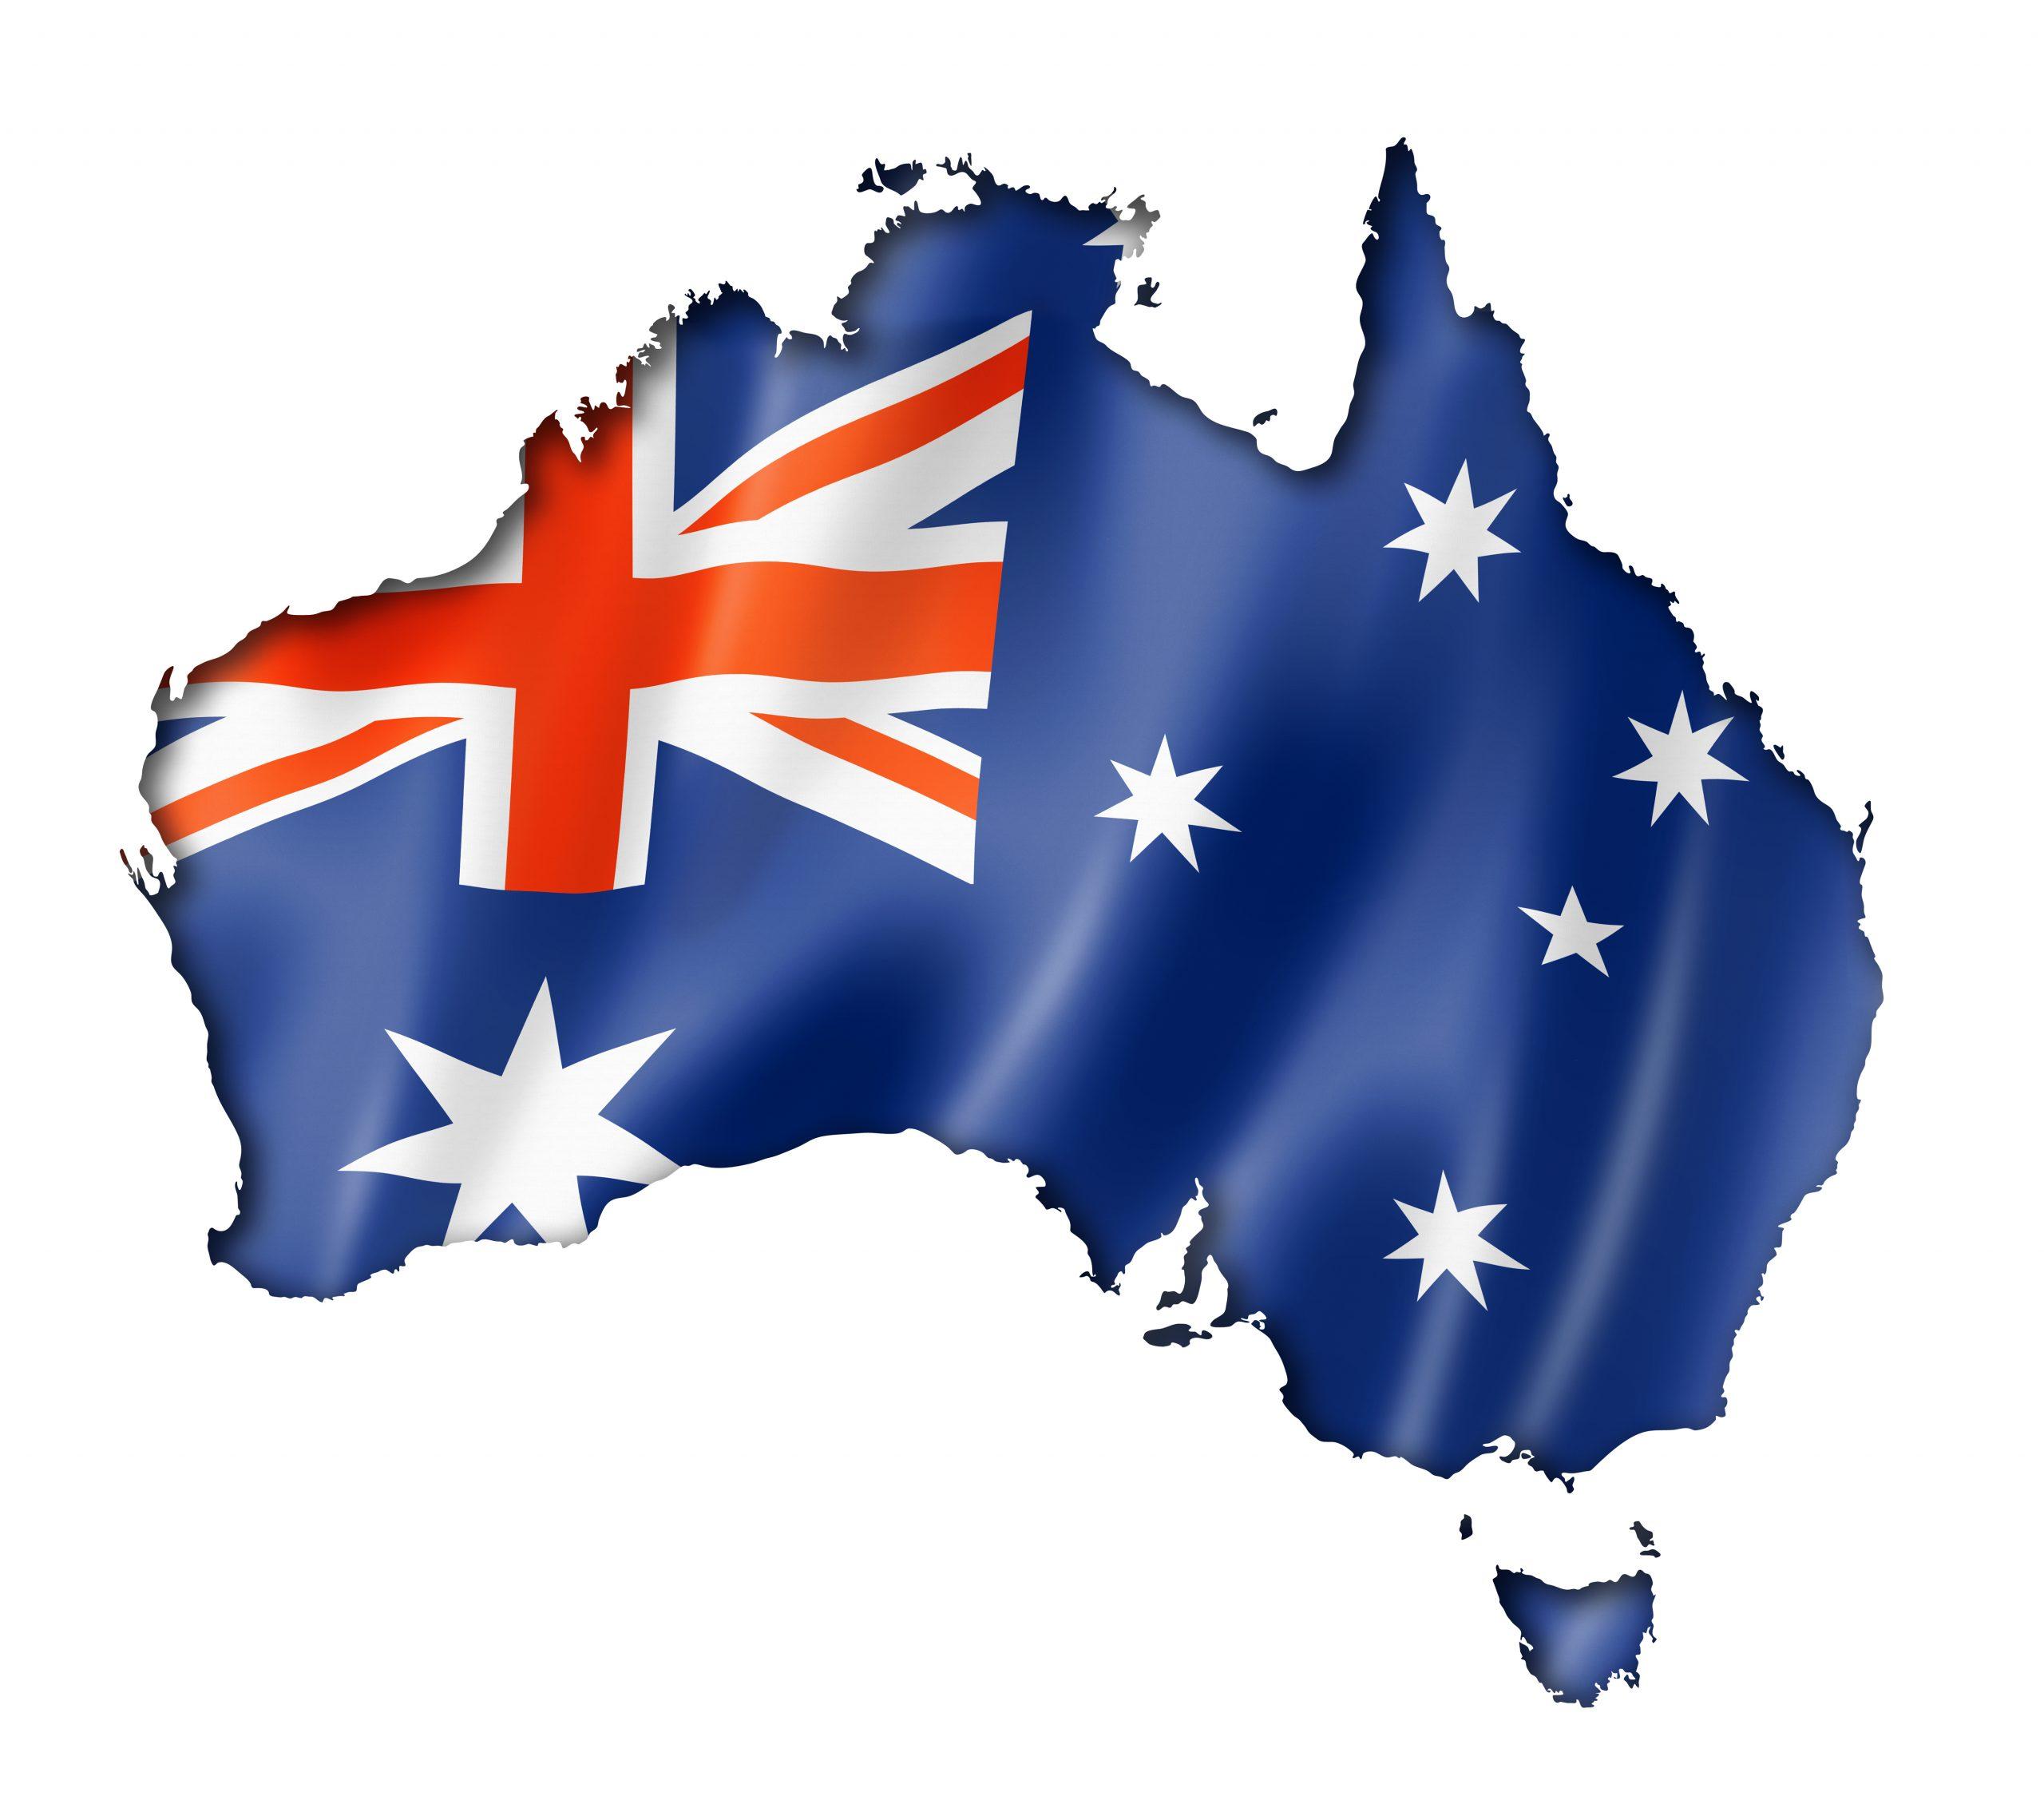 Cosmo USA Spain Australia Hospitality Internship Program Cosmopolitan USA Travel Work Train abroad